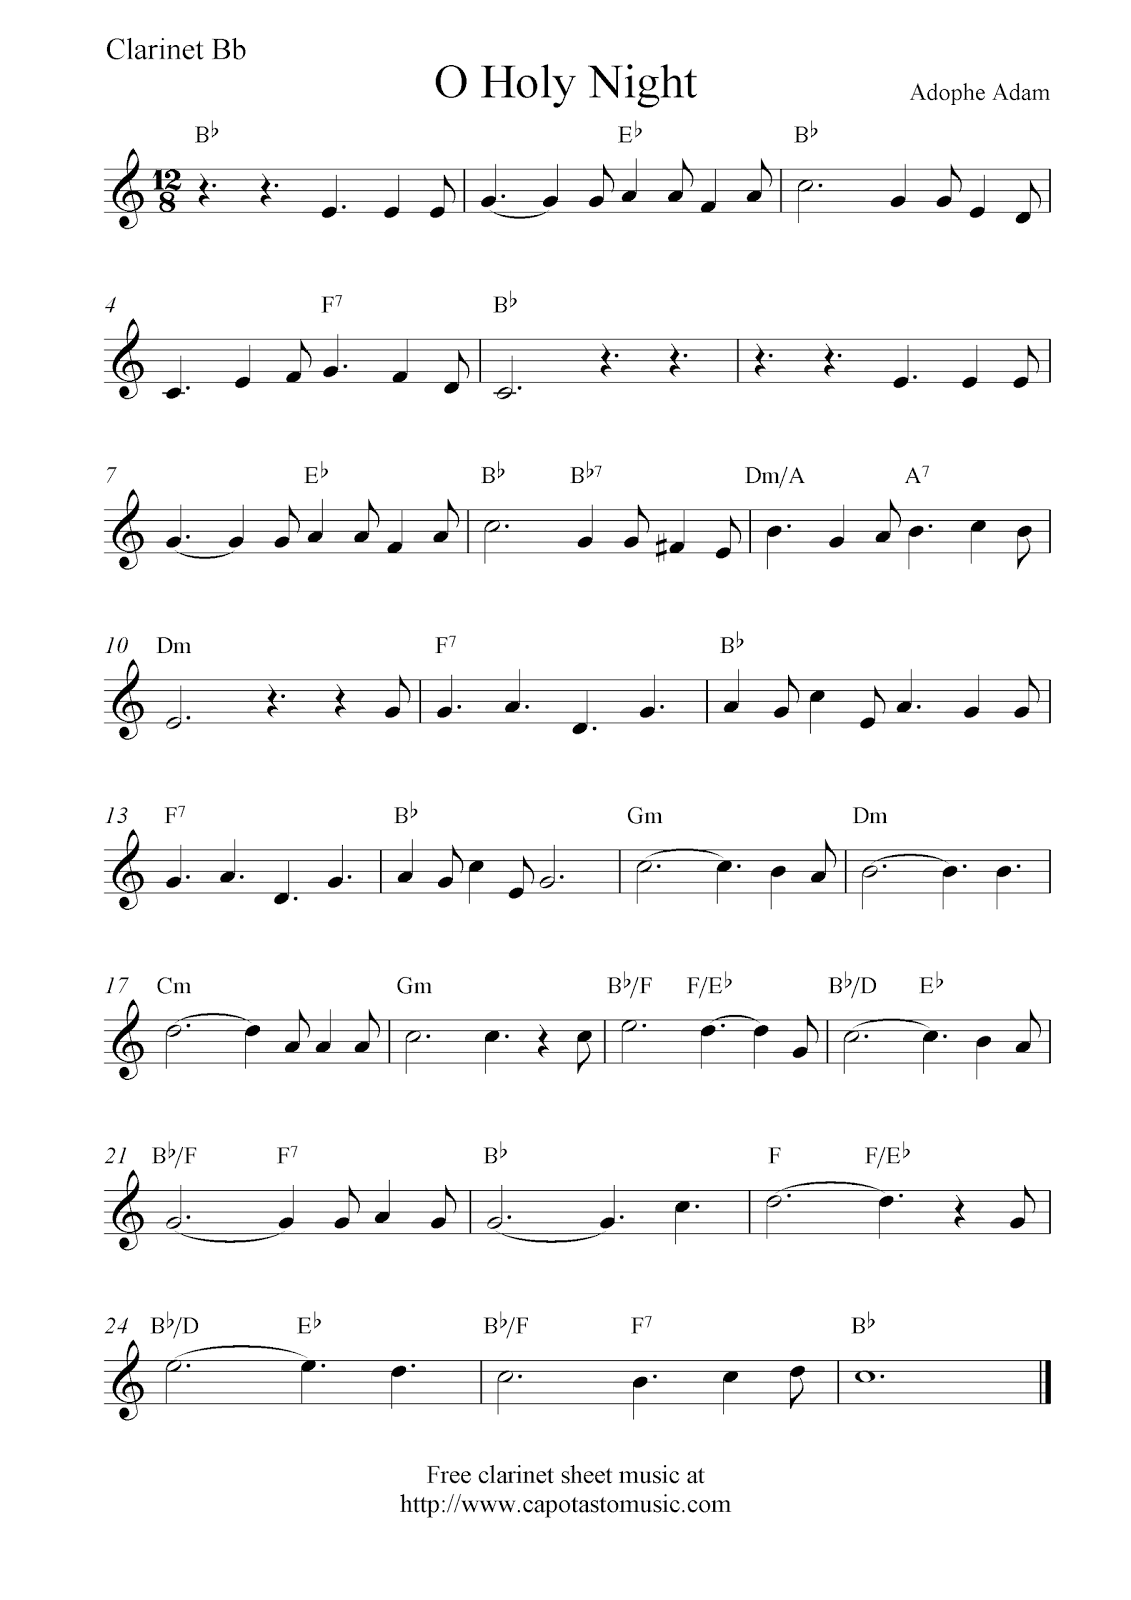 O Holy Night Free Christmas Clarinet Sheet Music Notes